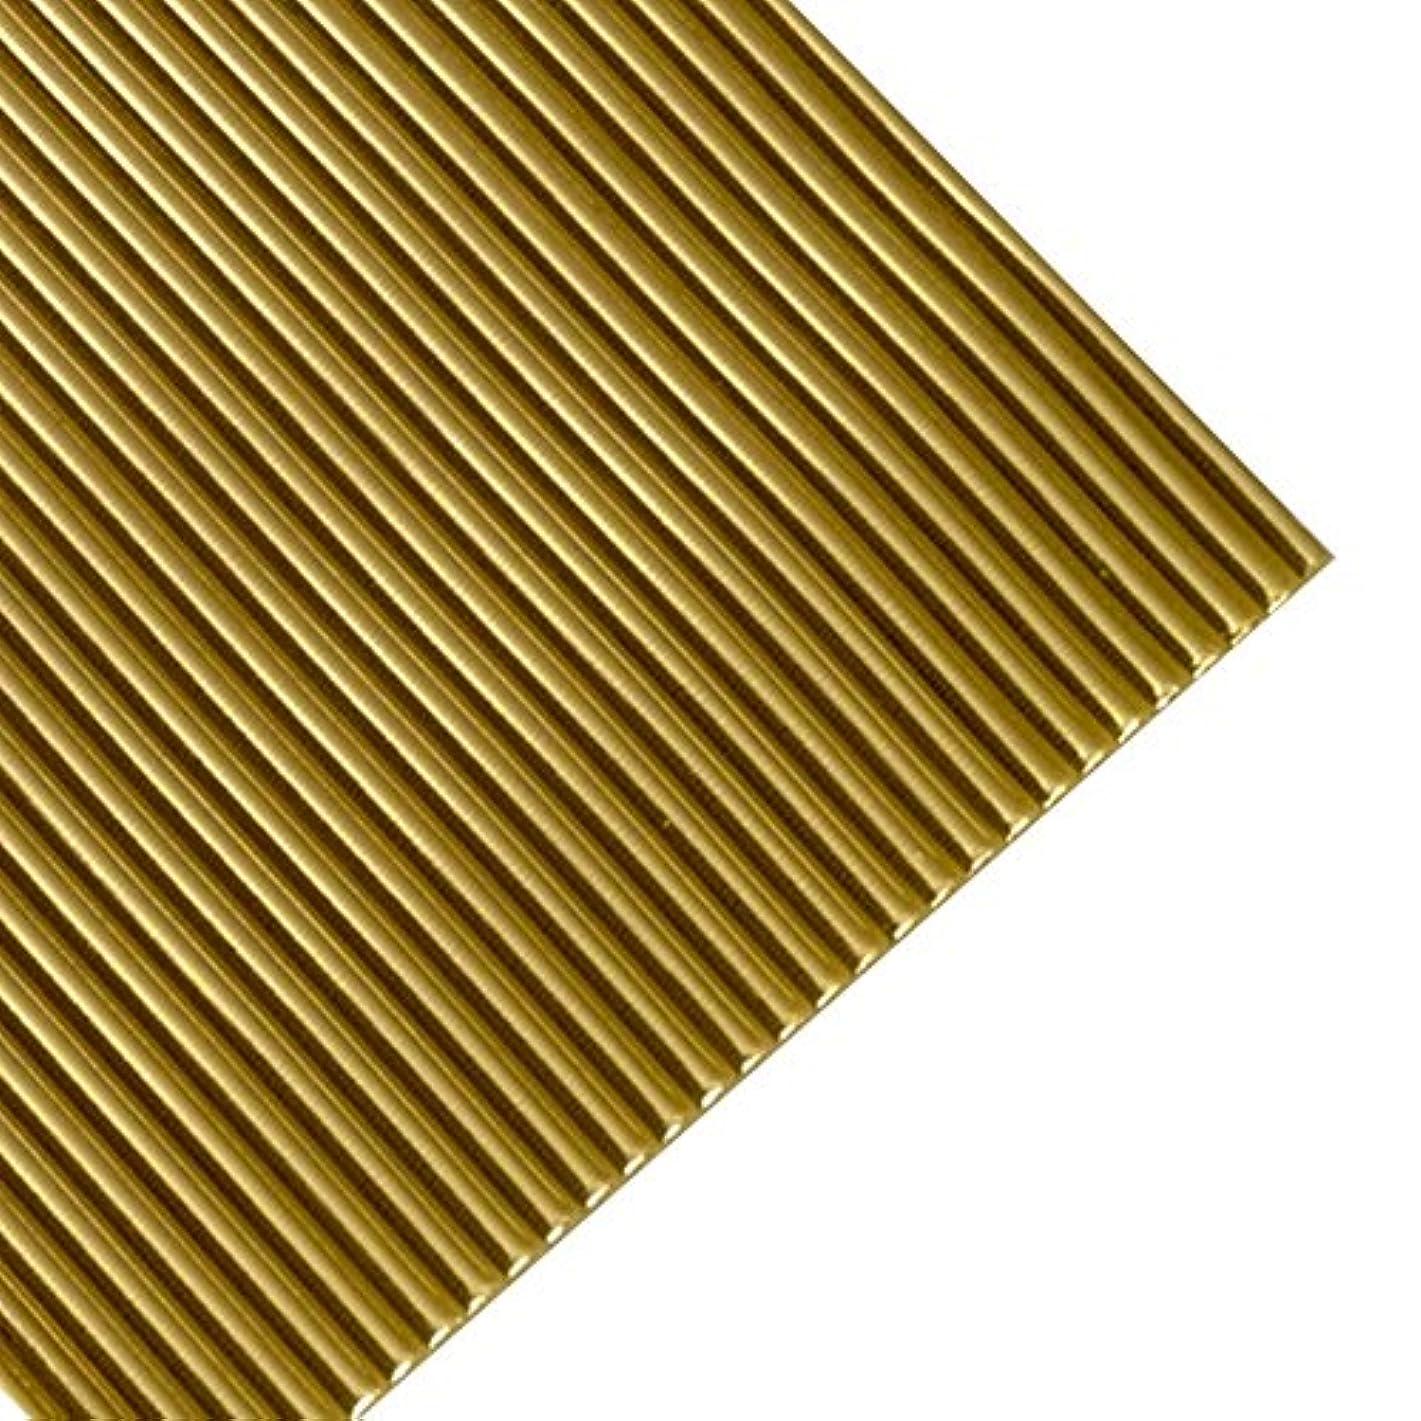 Efco Wax Strips Round 200 x 2 mm 10 pcs. Gold Brilliant